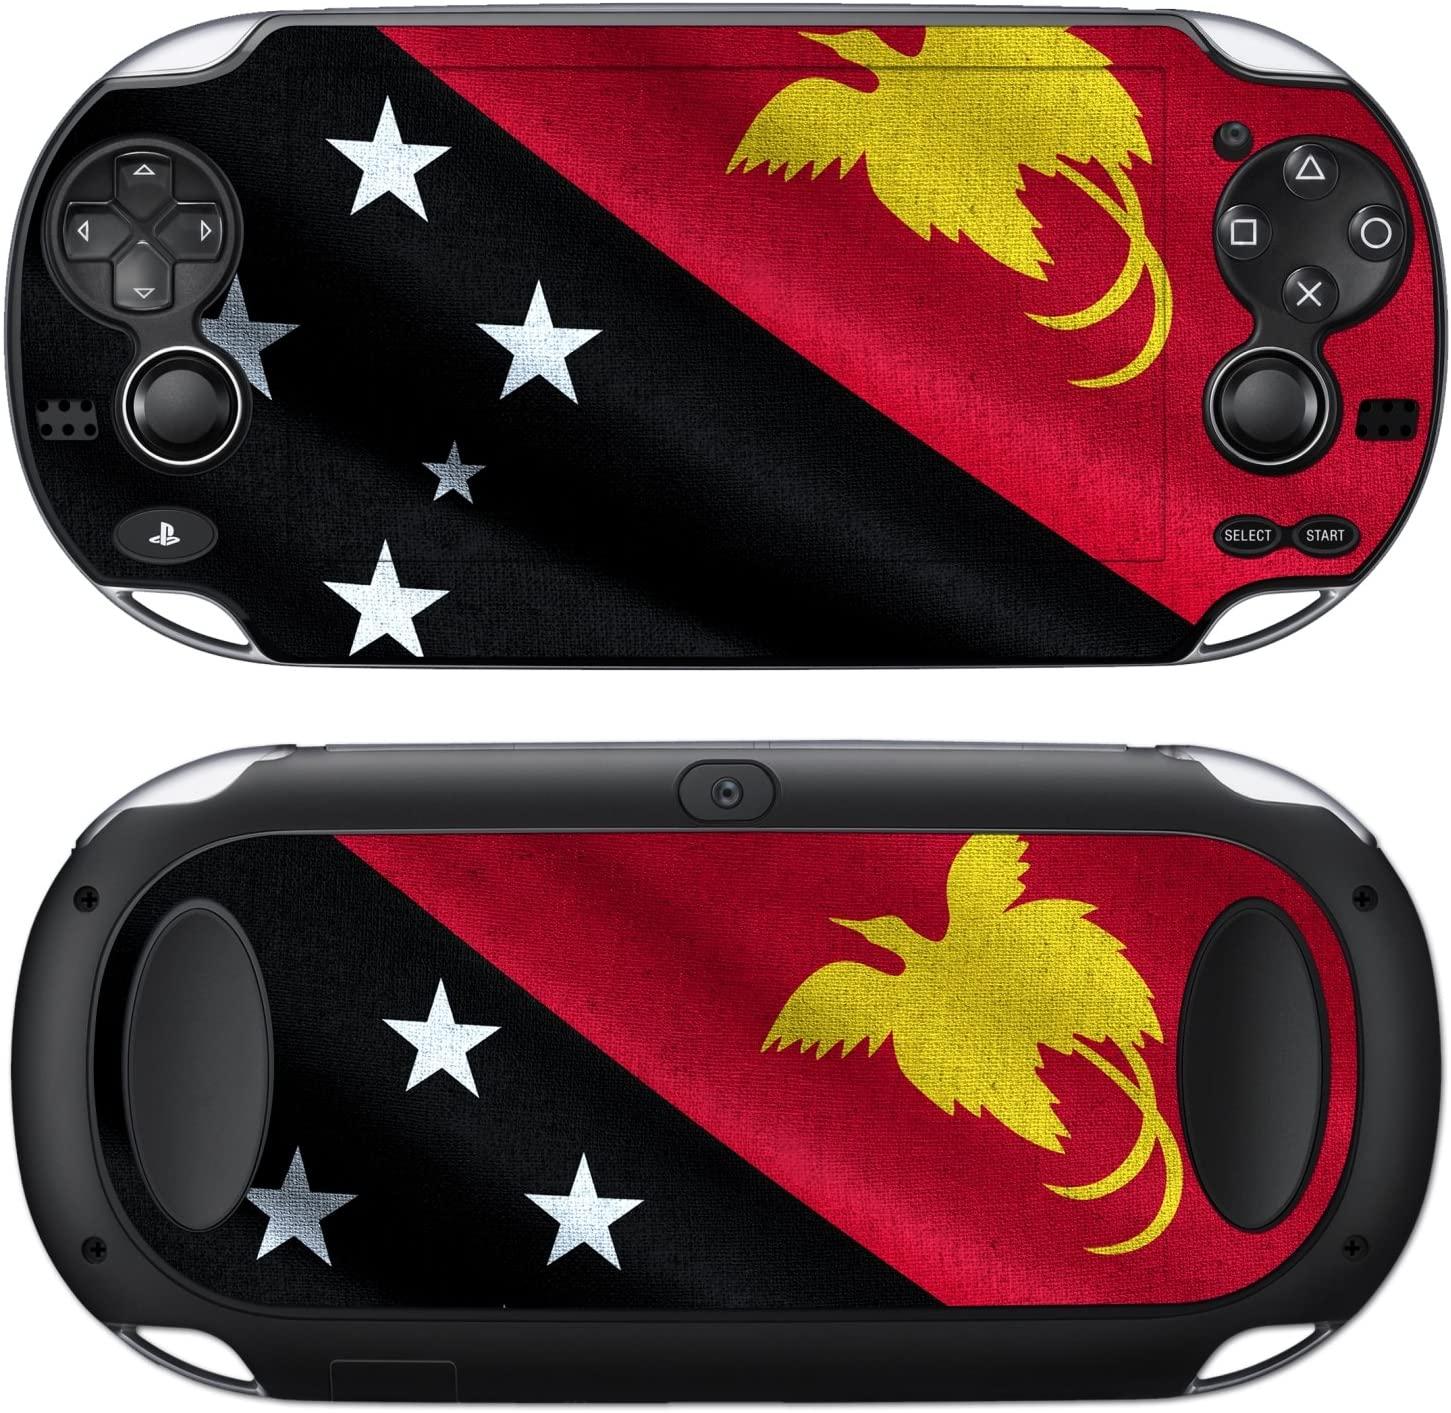 Sony PlayStation Vita Design Skin